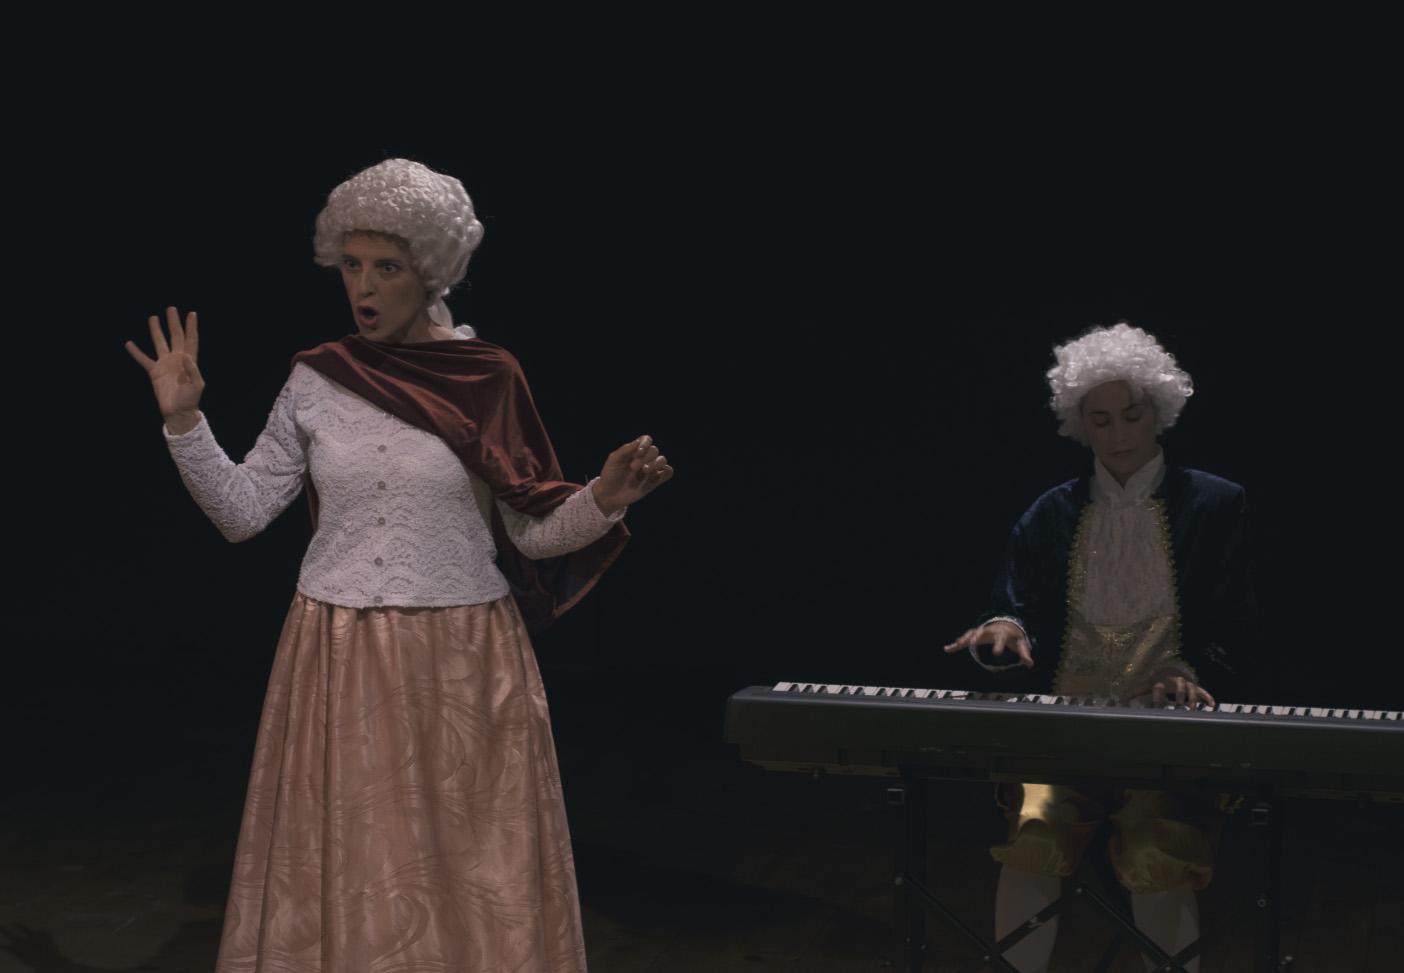 Nanerl Mozart